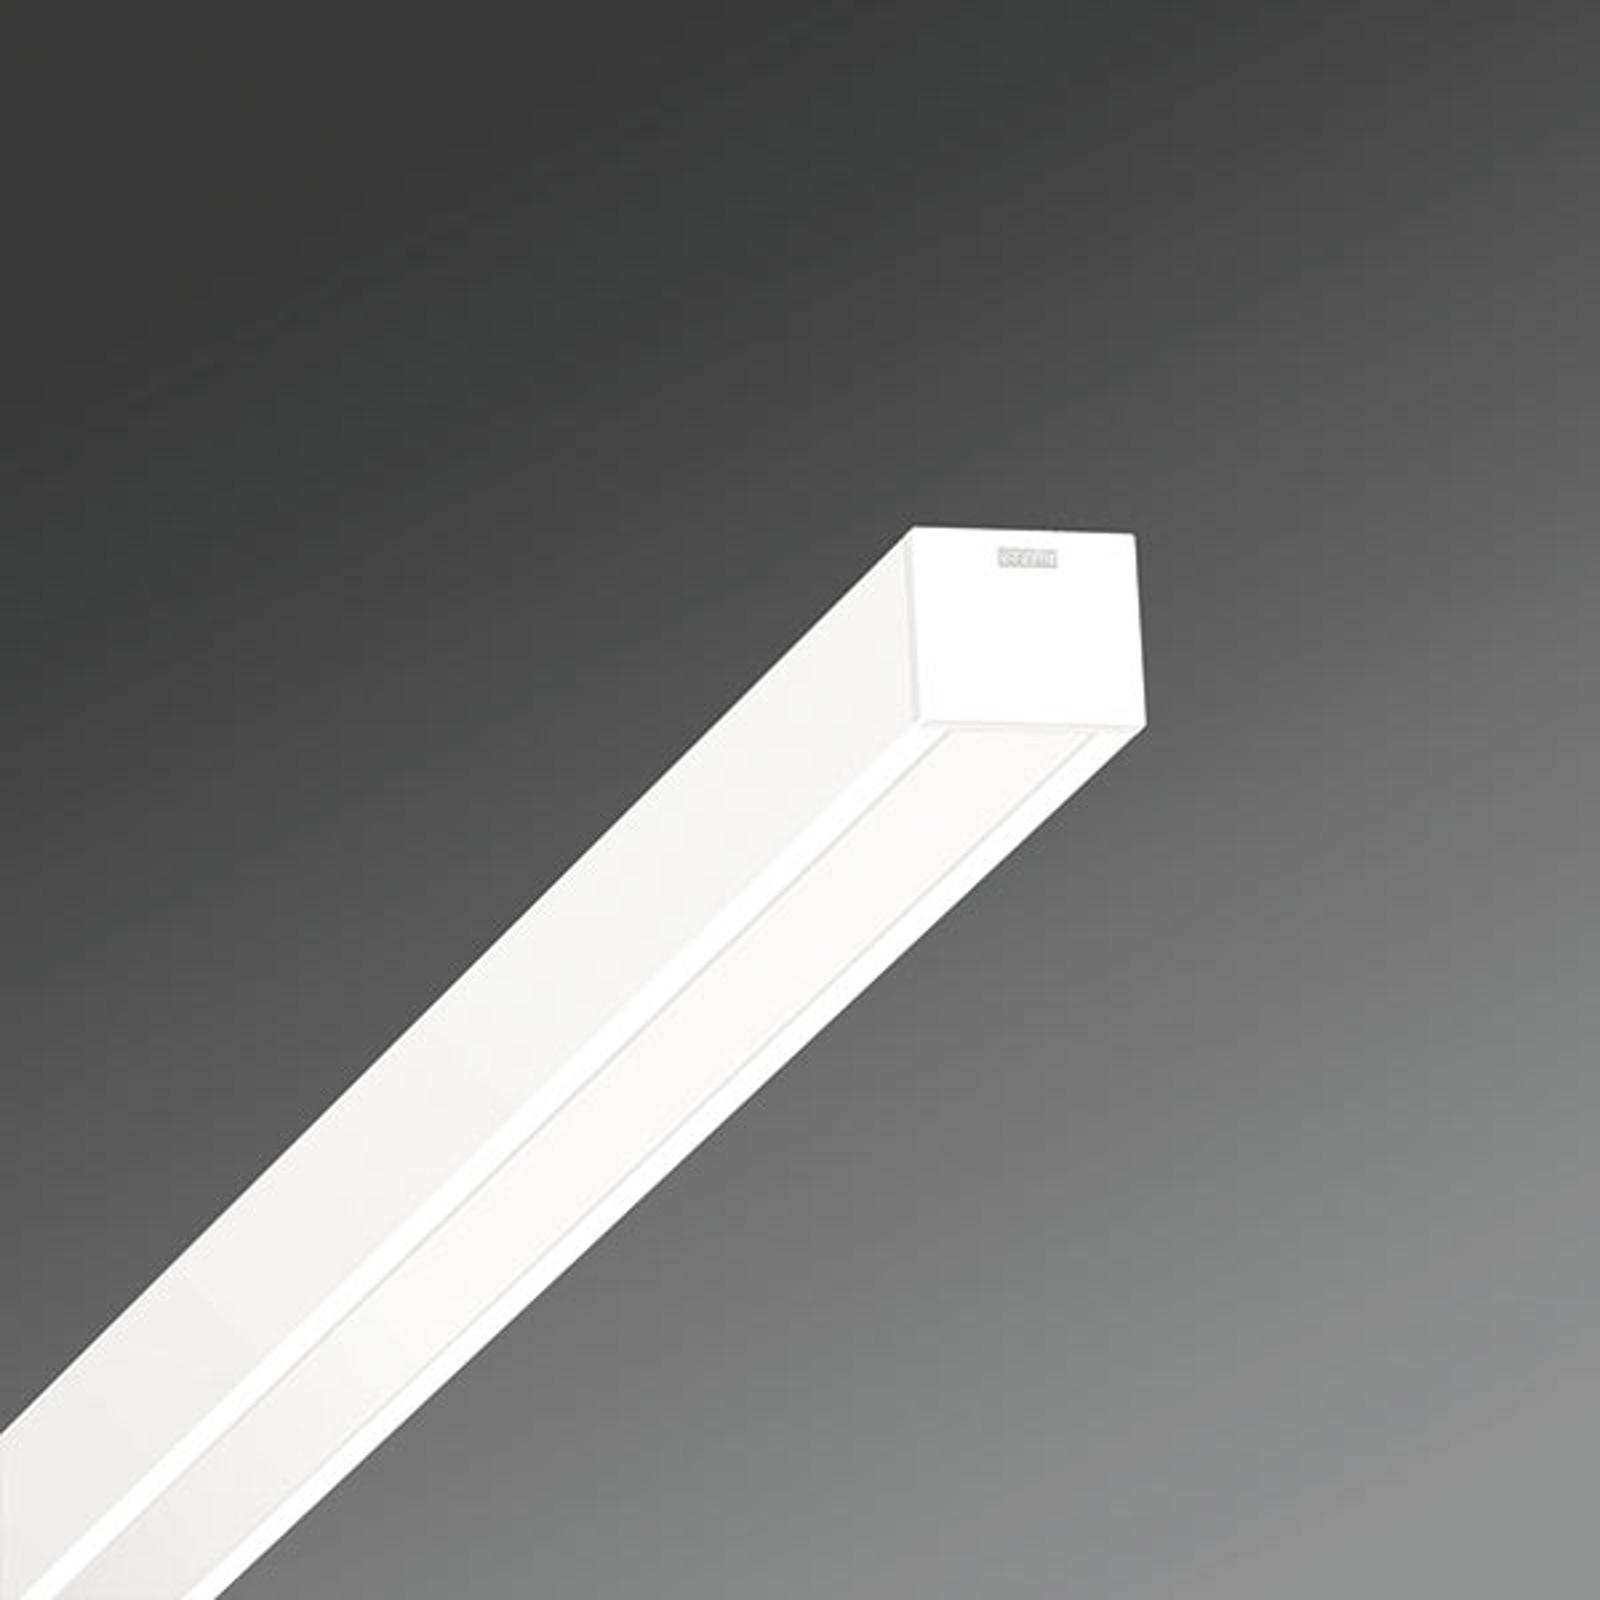 Hokal-HLAG/1500 LED - kanałowa lampa sufitowa 36W